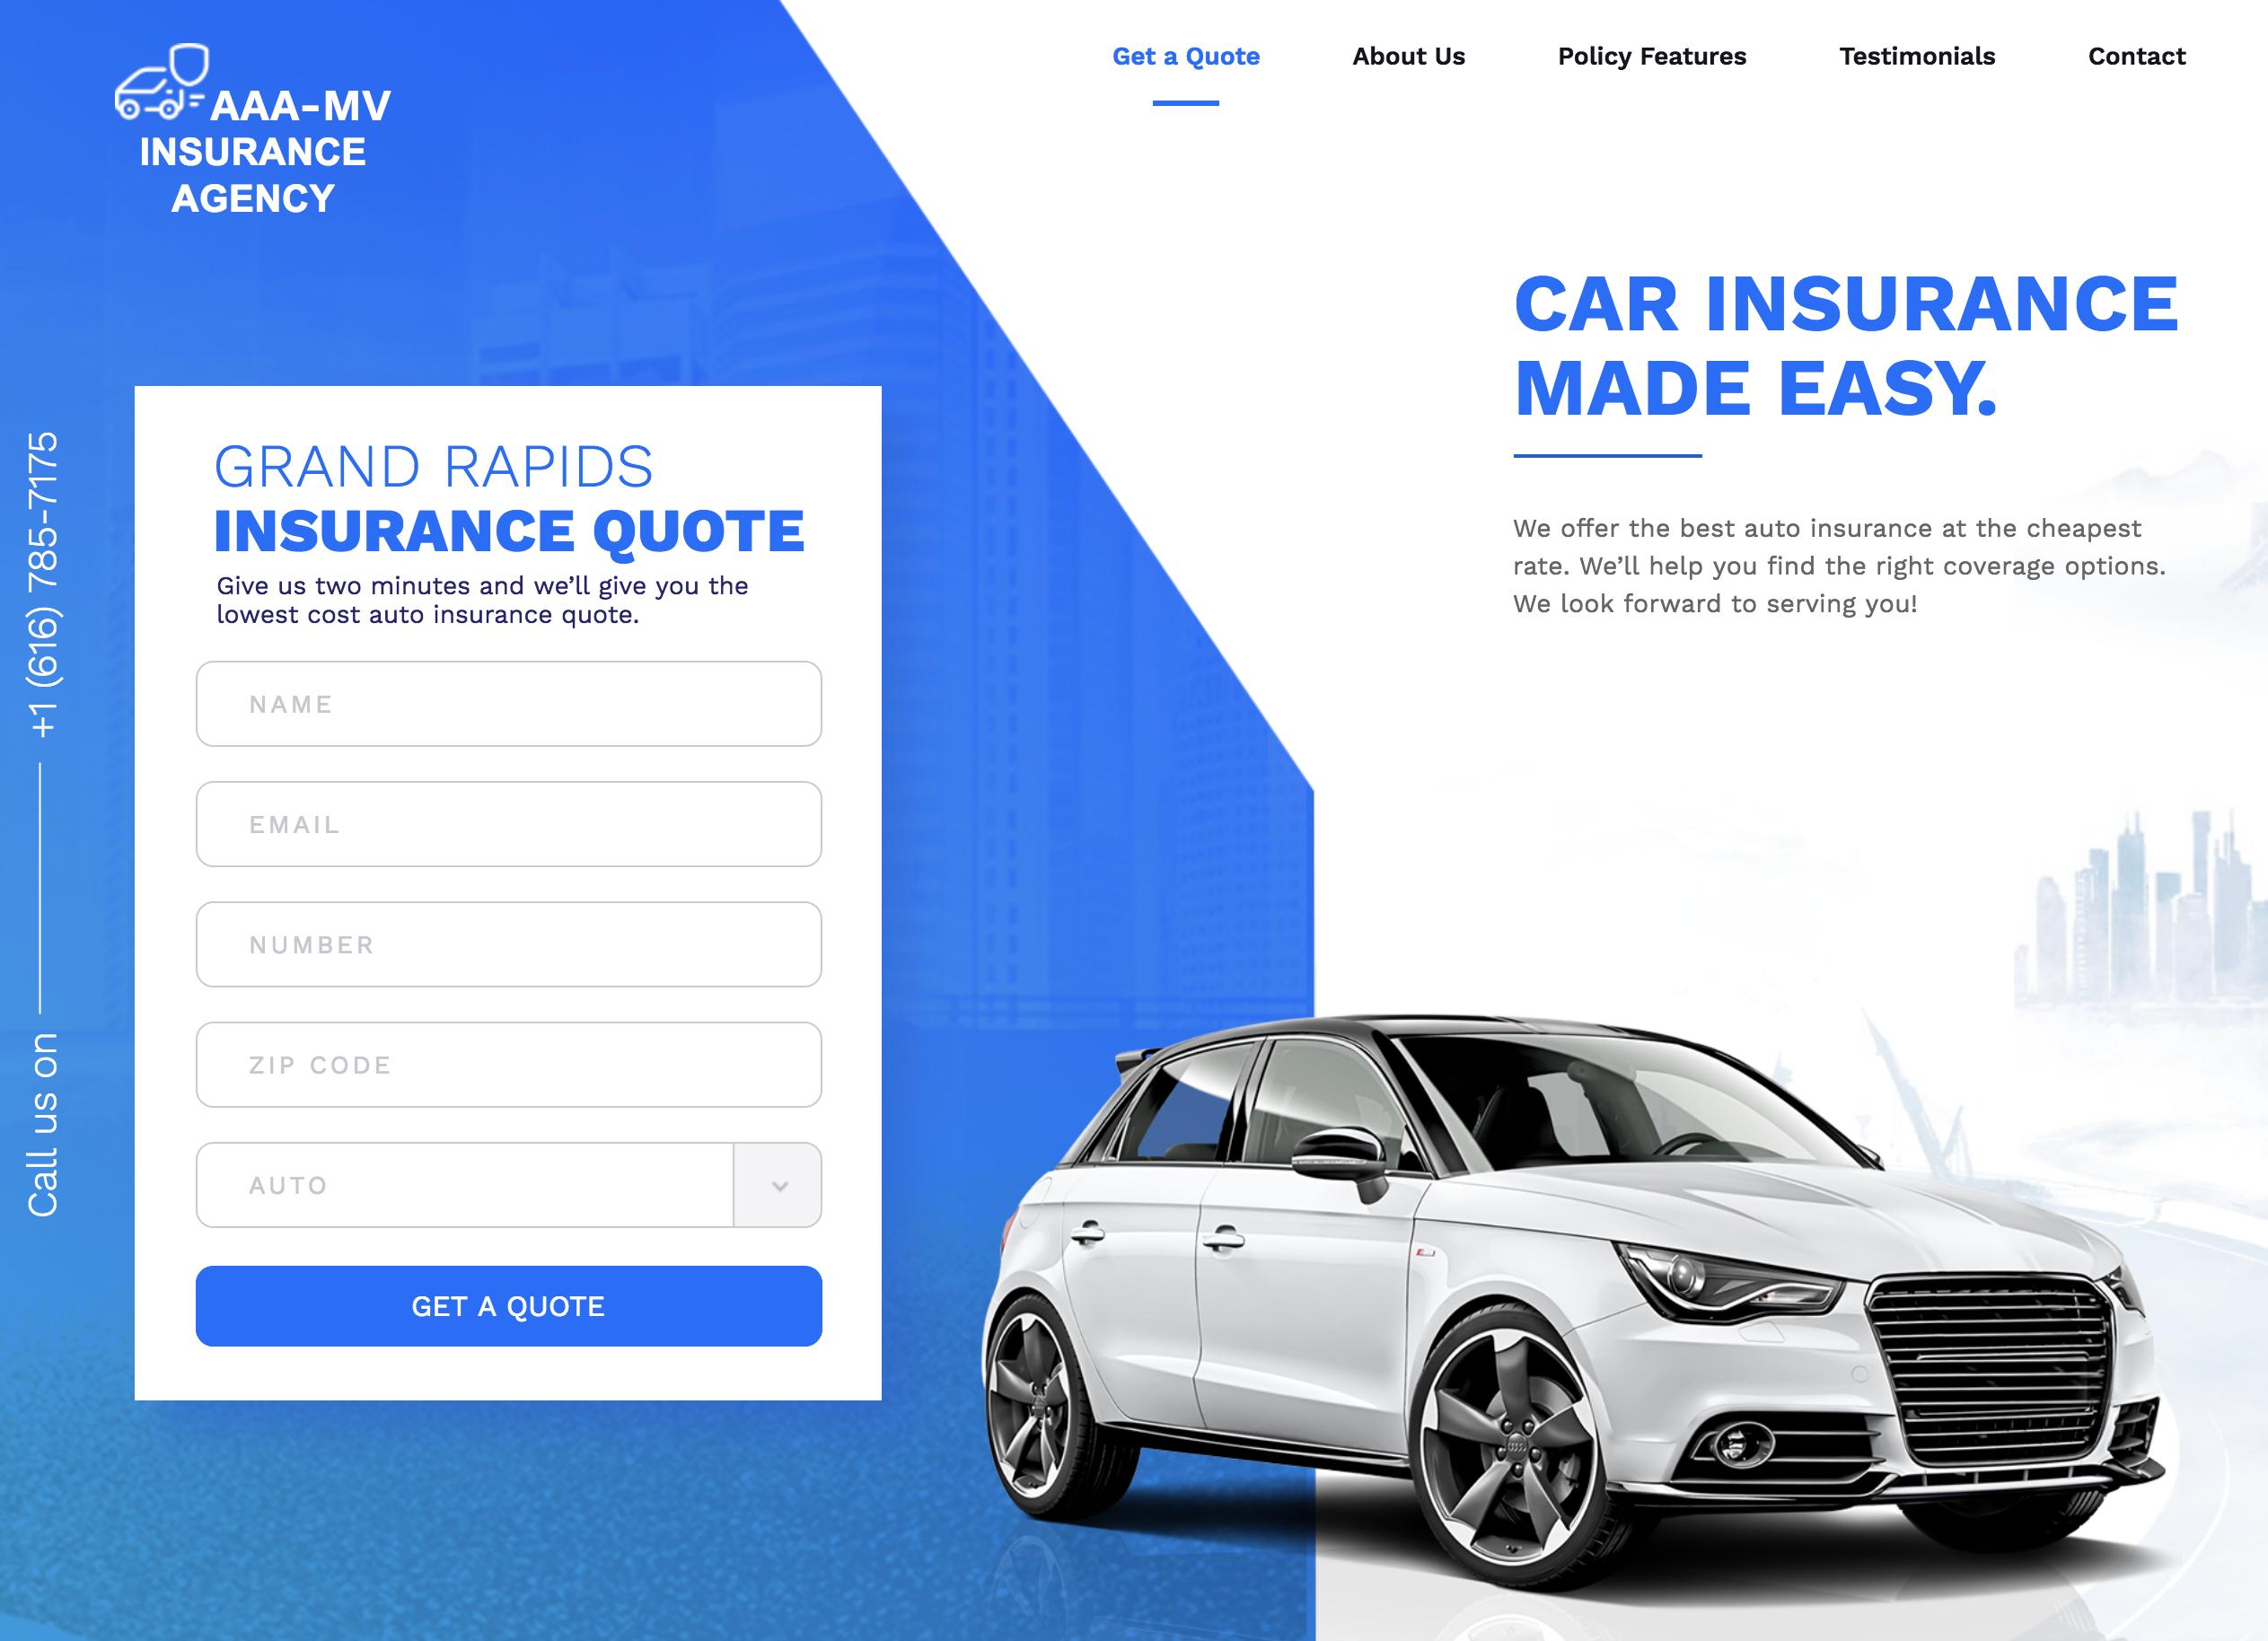 MV Insurance Agency image 2